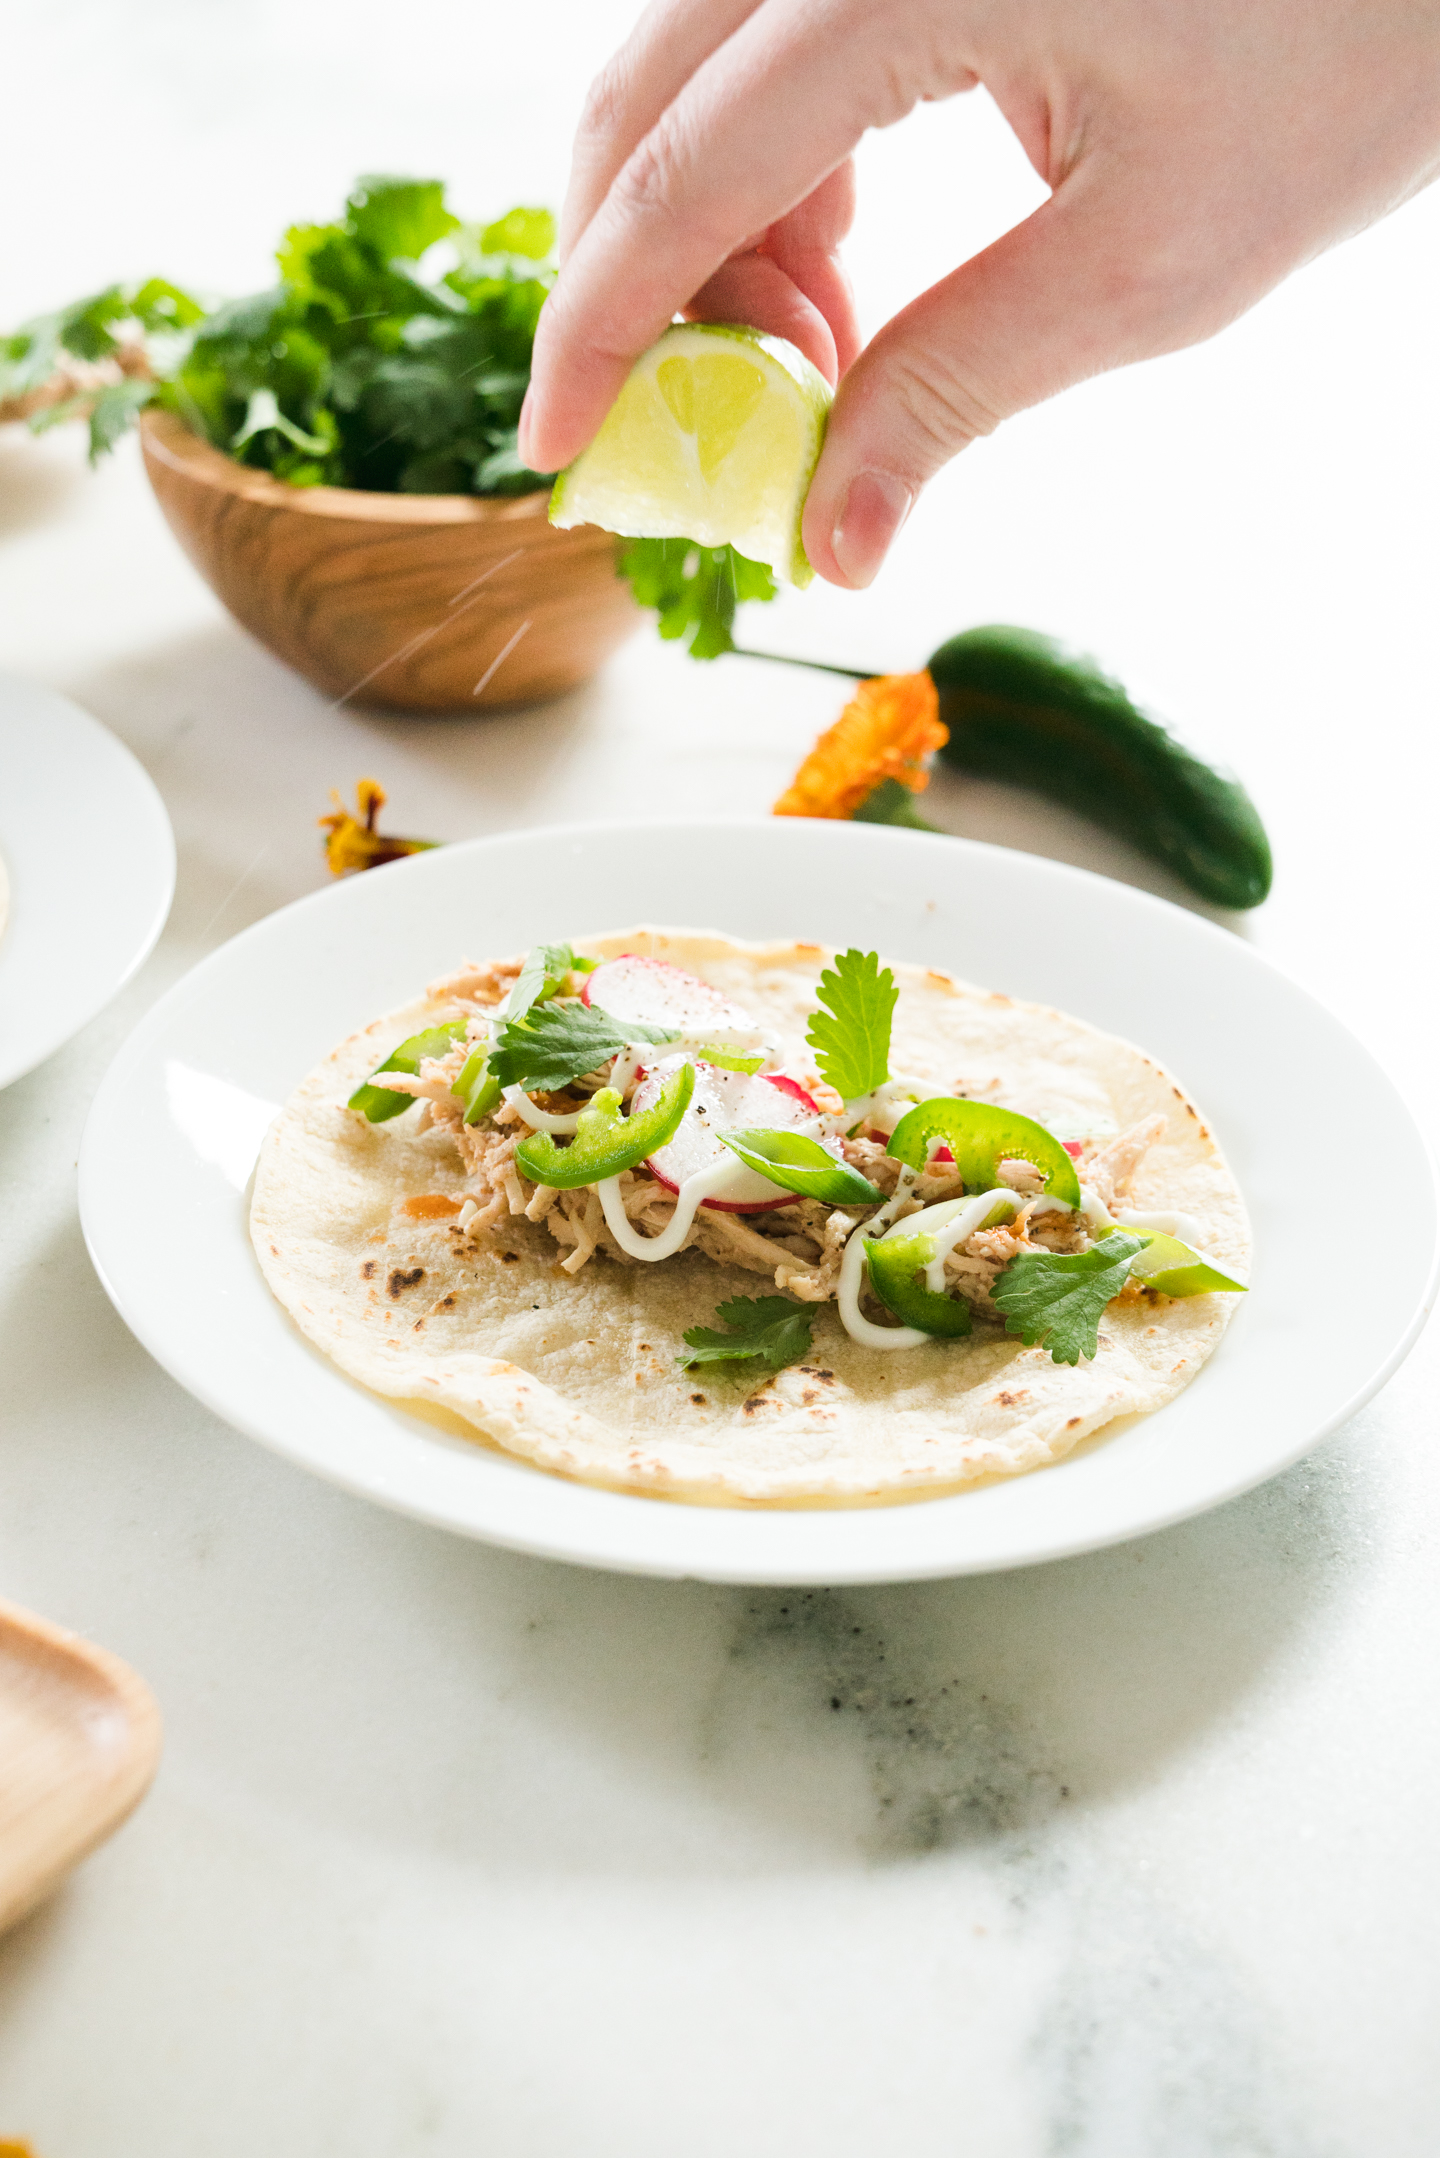 Five Spice Chicken Tacos